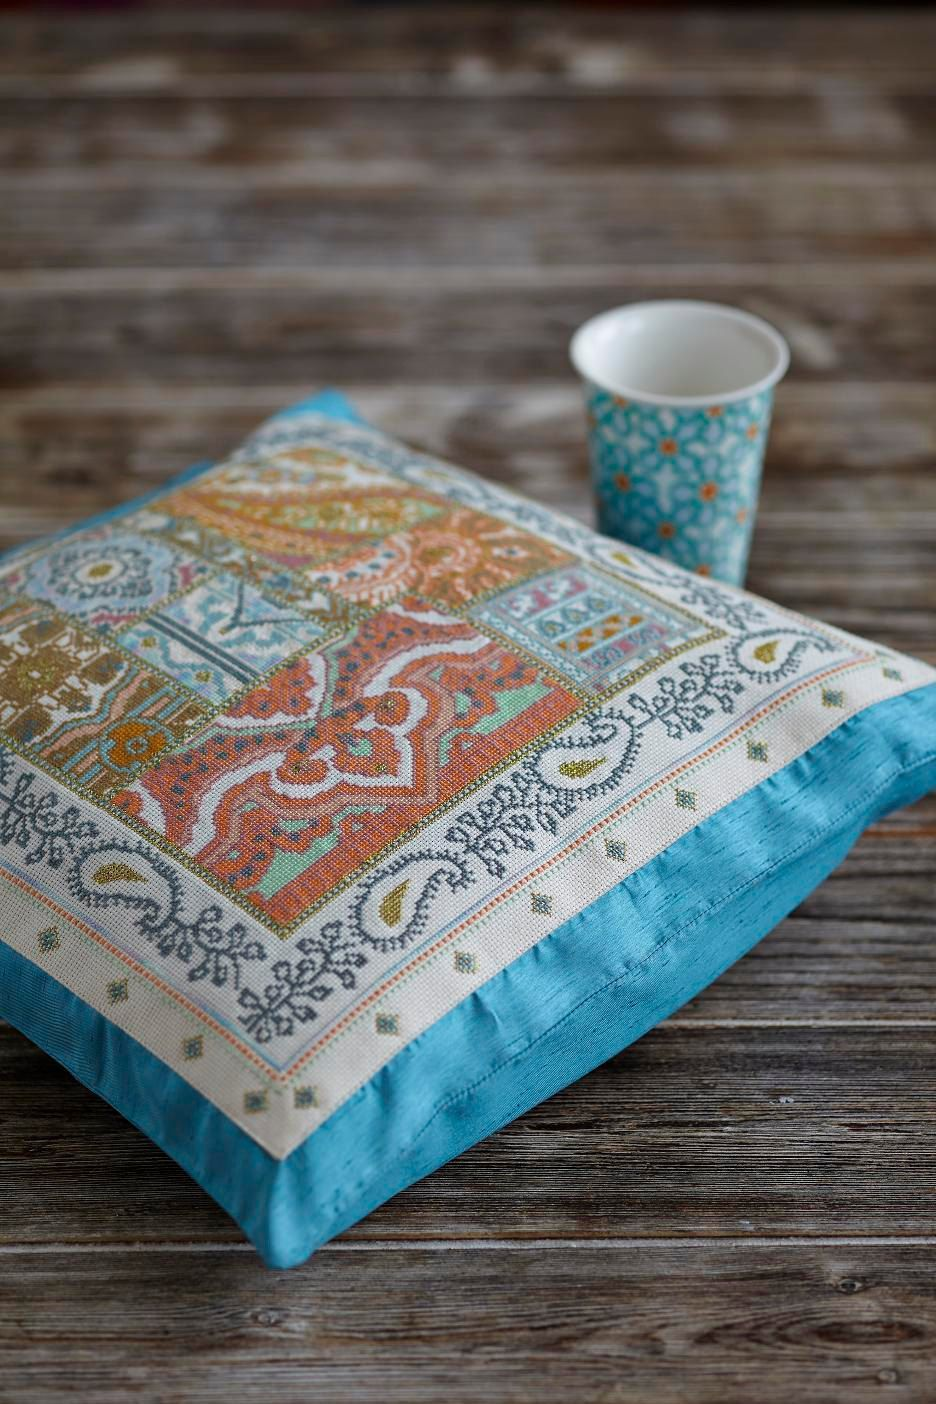 RESORT - coral,turquoise cross stitch pattern